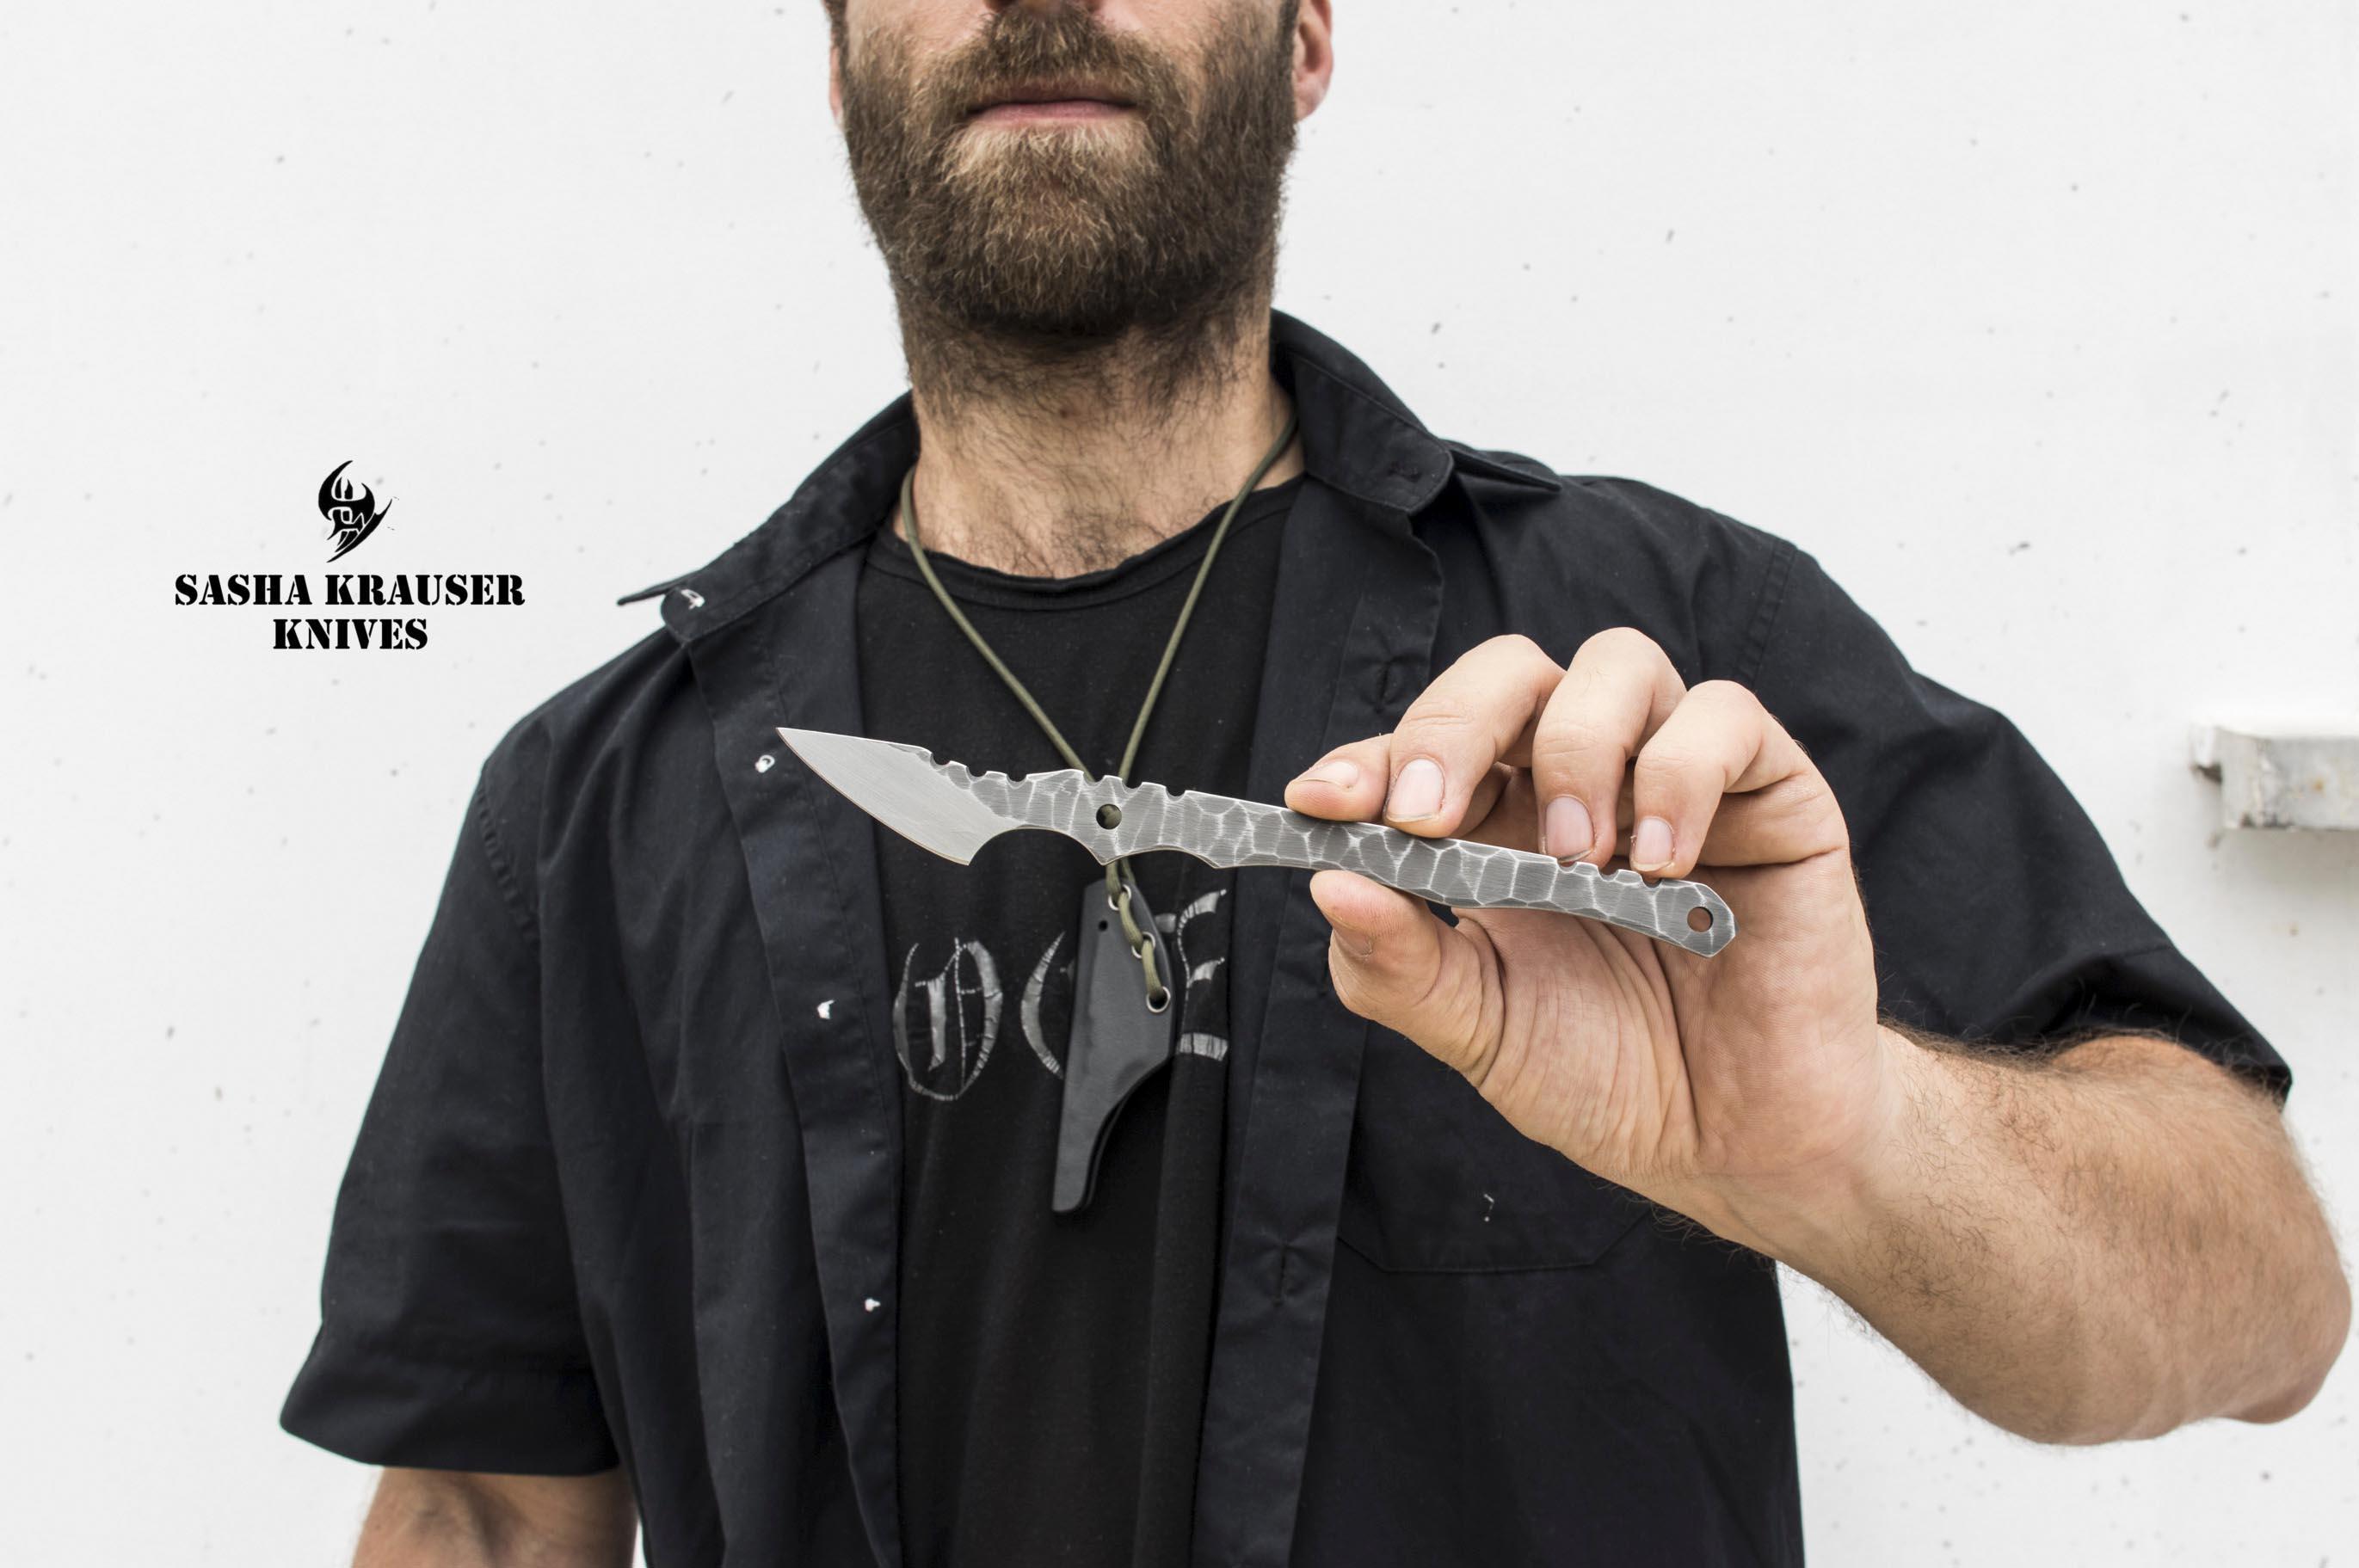 tranchet neck knife edc